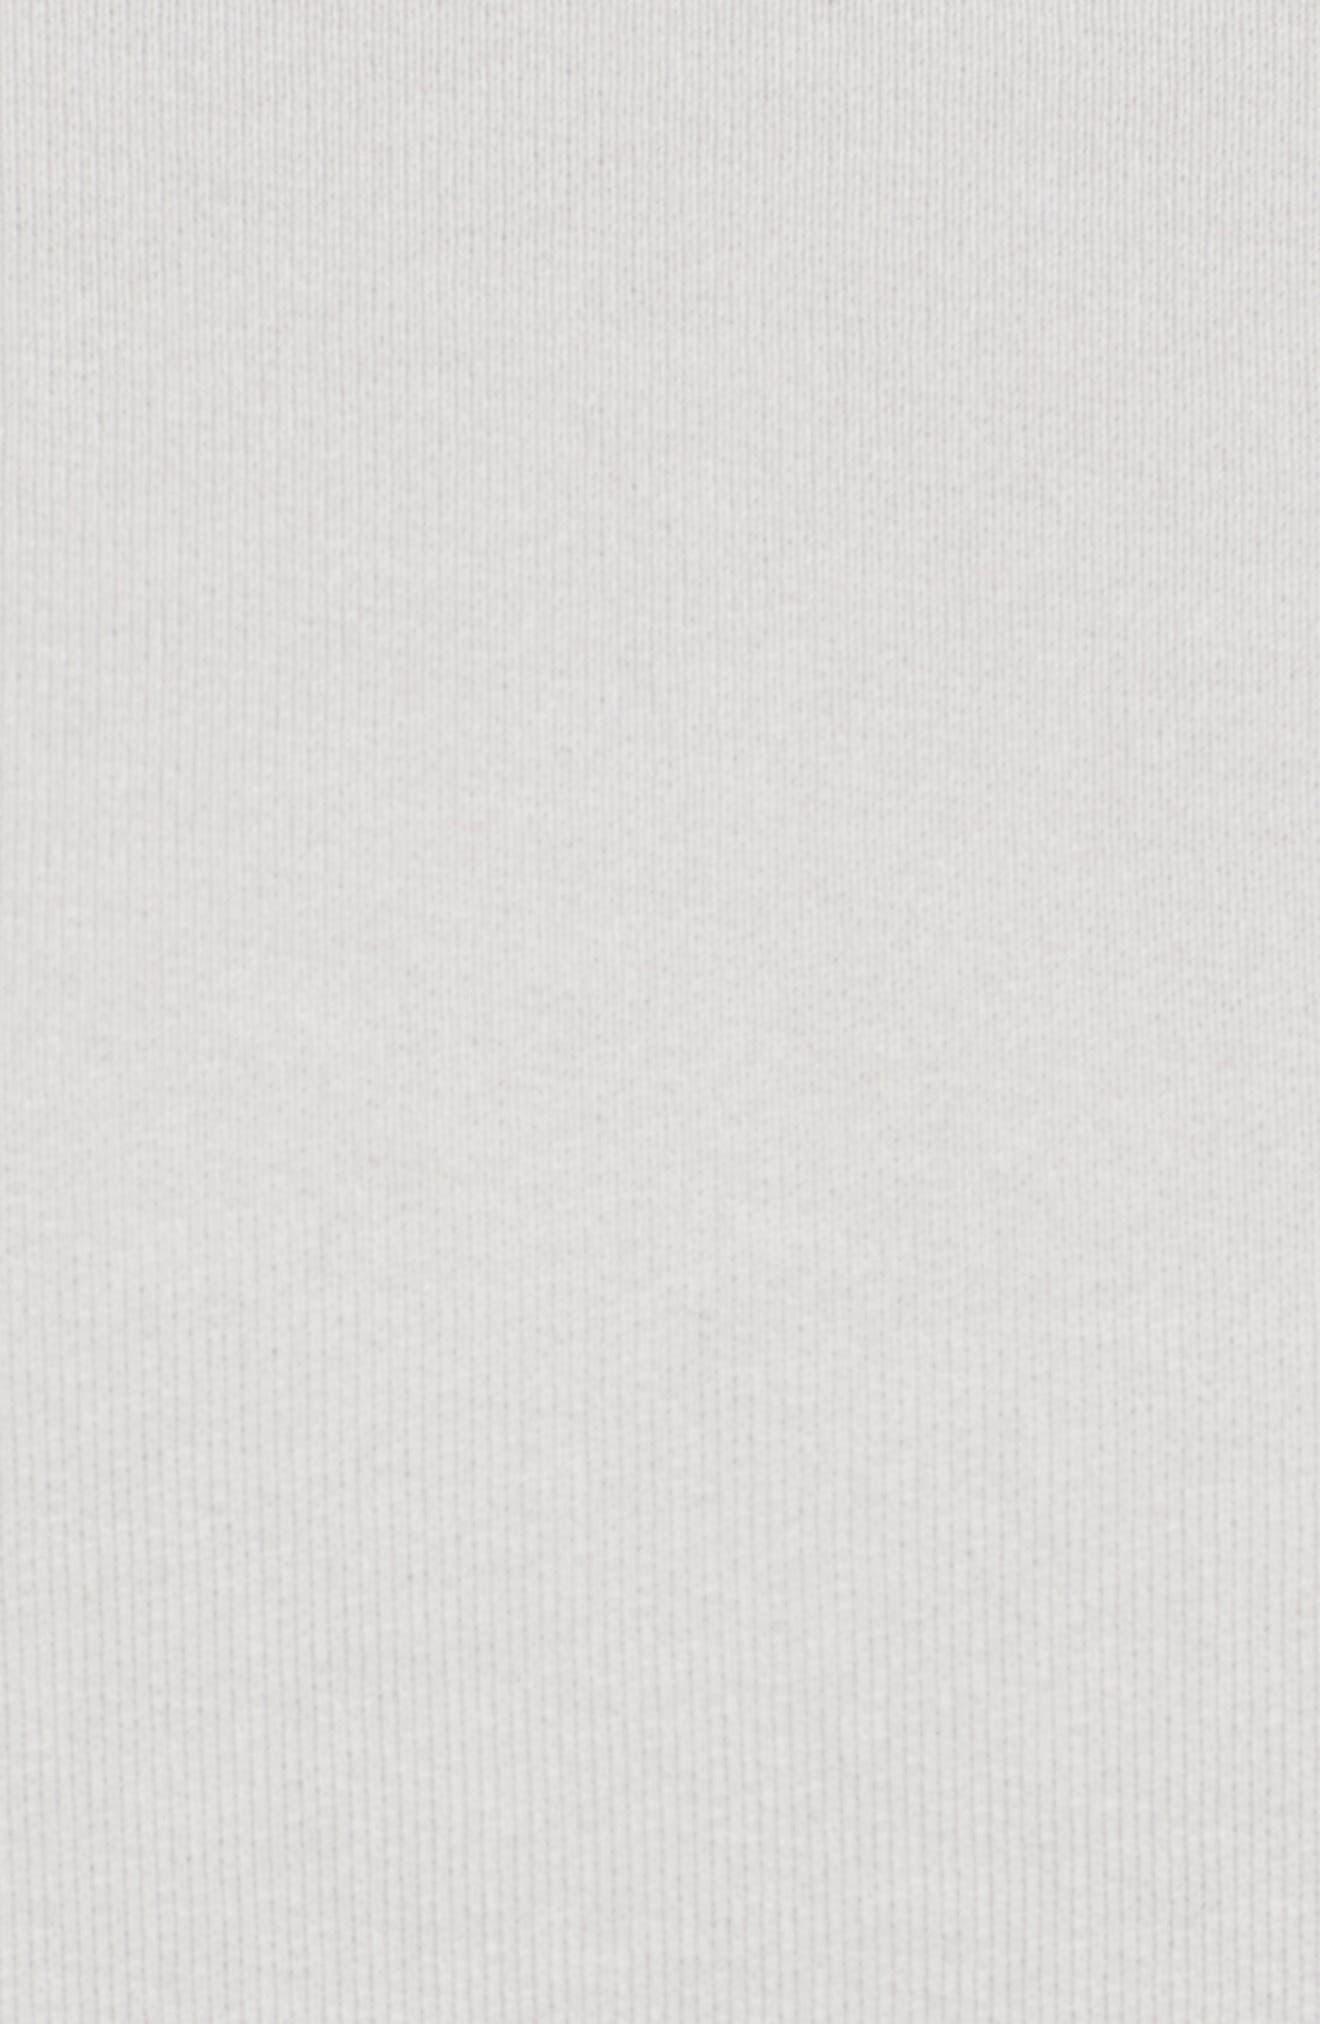 Asymmetric Sweatshirt,                             Alternate thumbnail 5, color,                             038